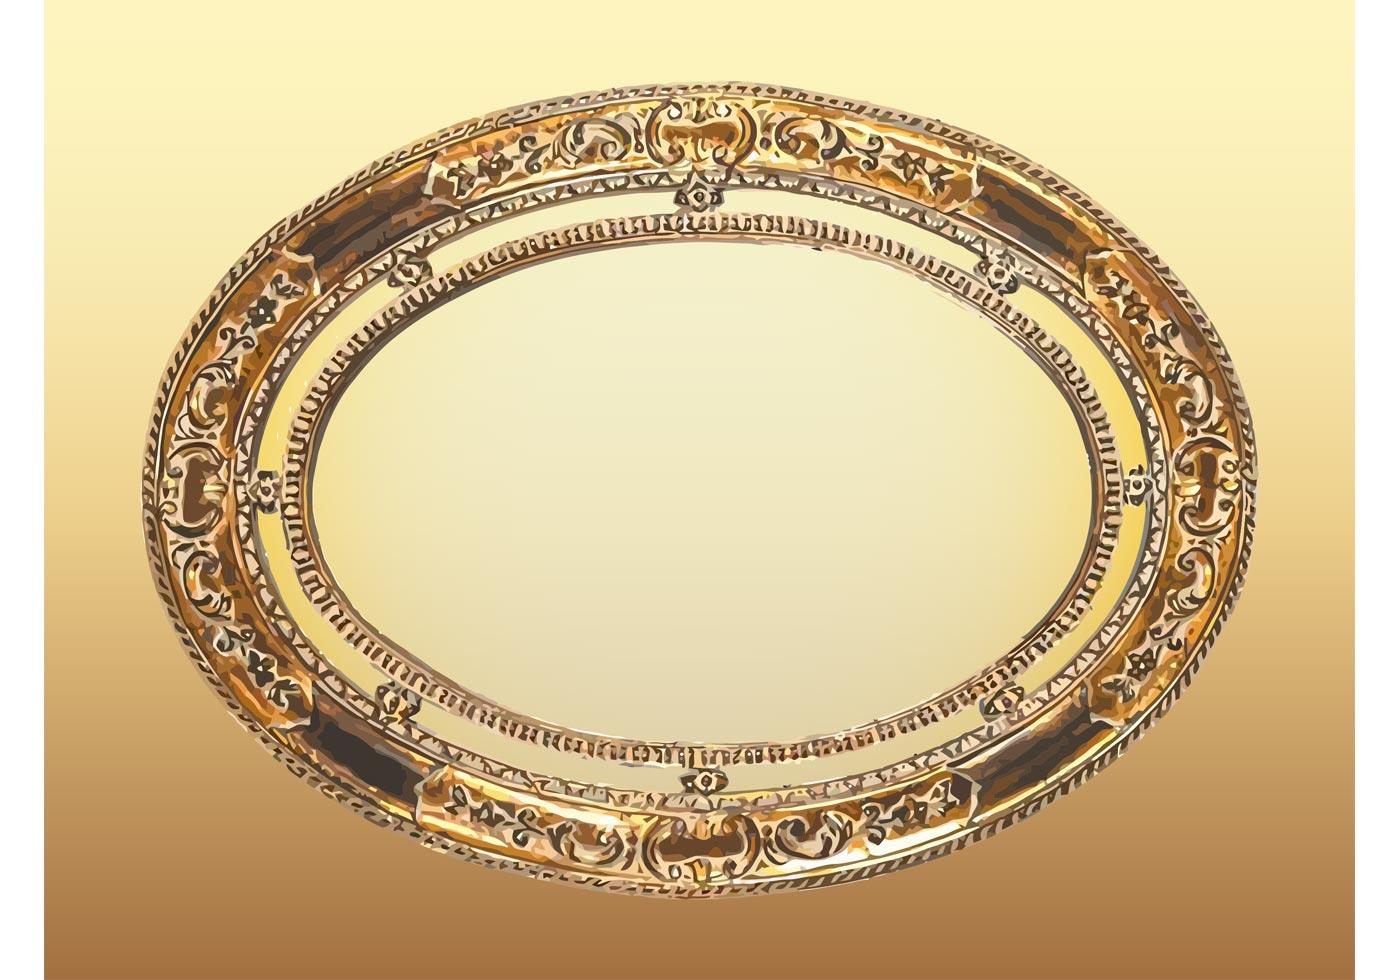 Fullsize Of Oval Picture Frame